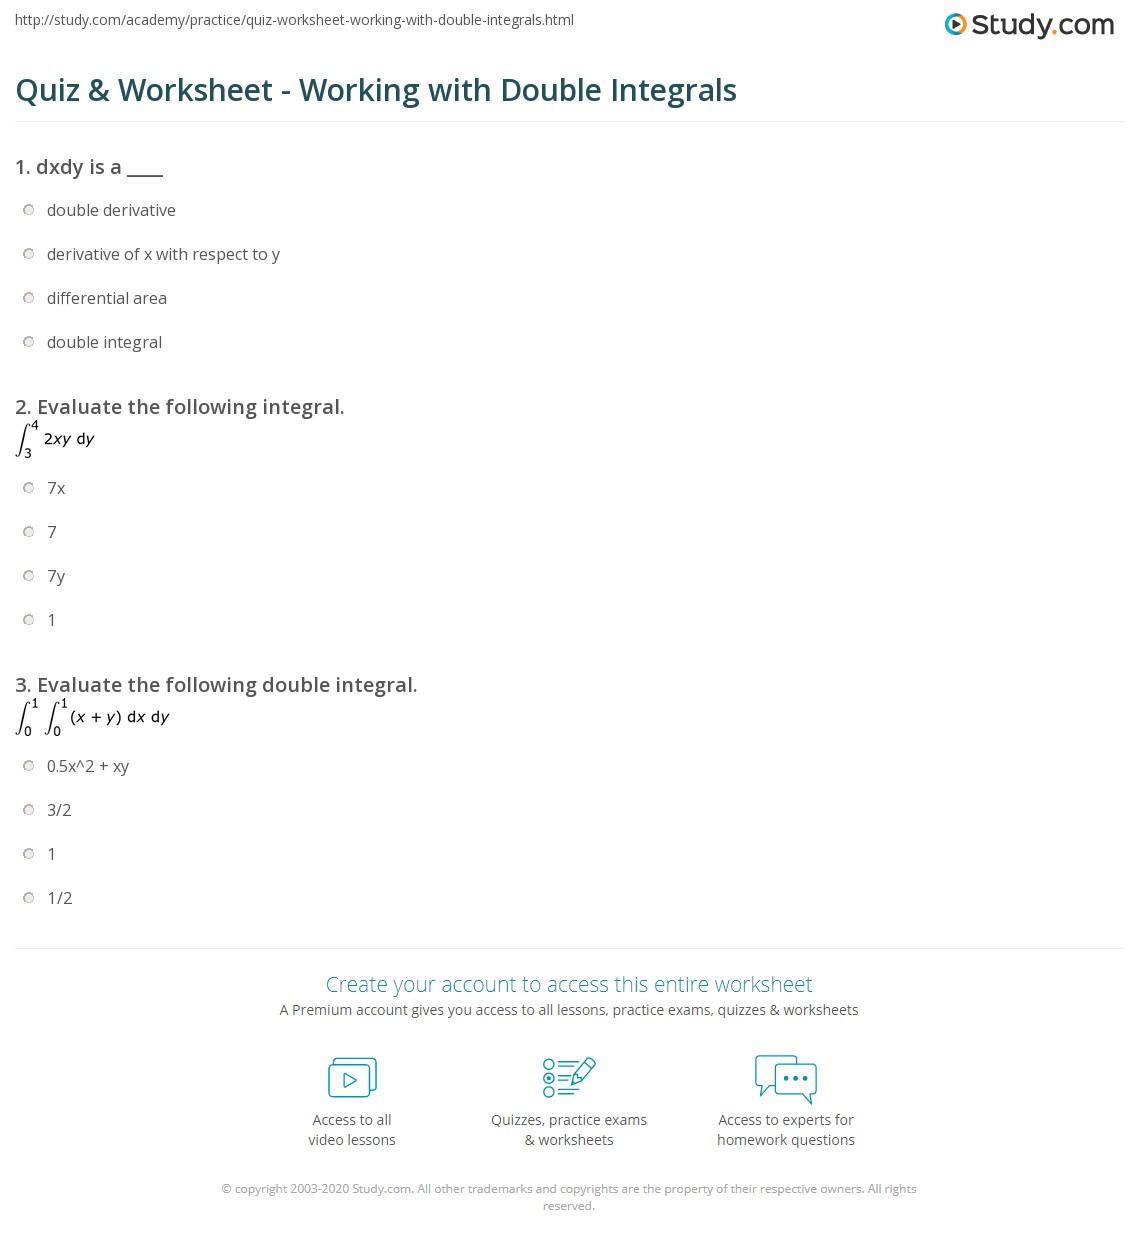 quiz worksheet working with double integrals. Black Bedroom Furniture Sets. Home Design Ideas